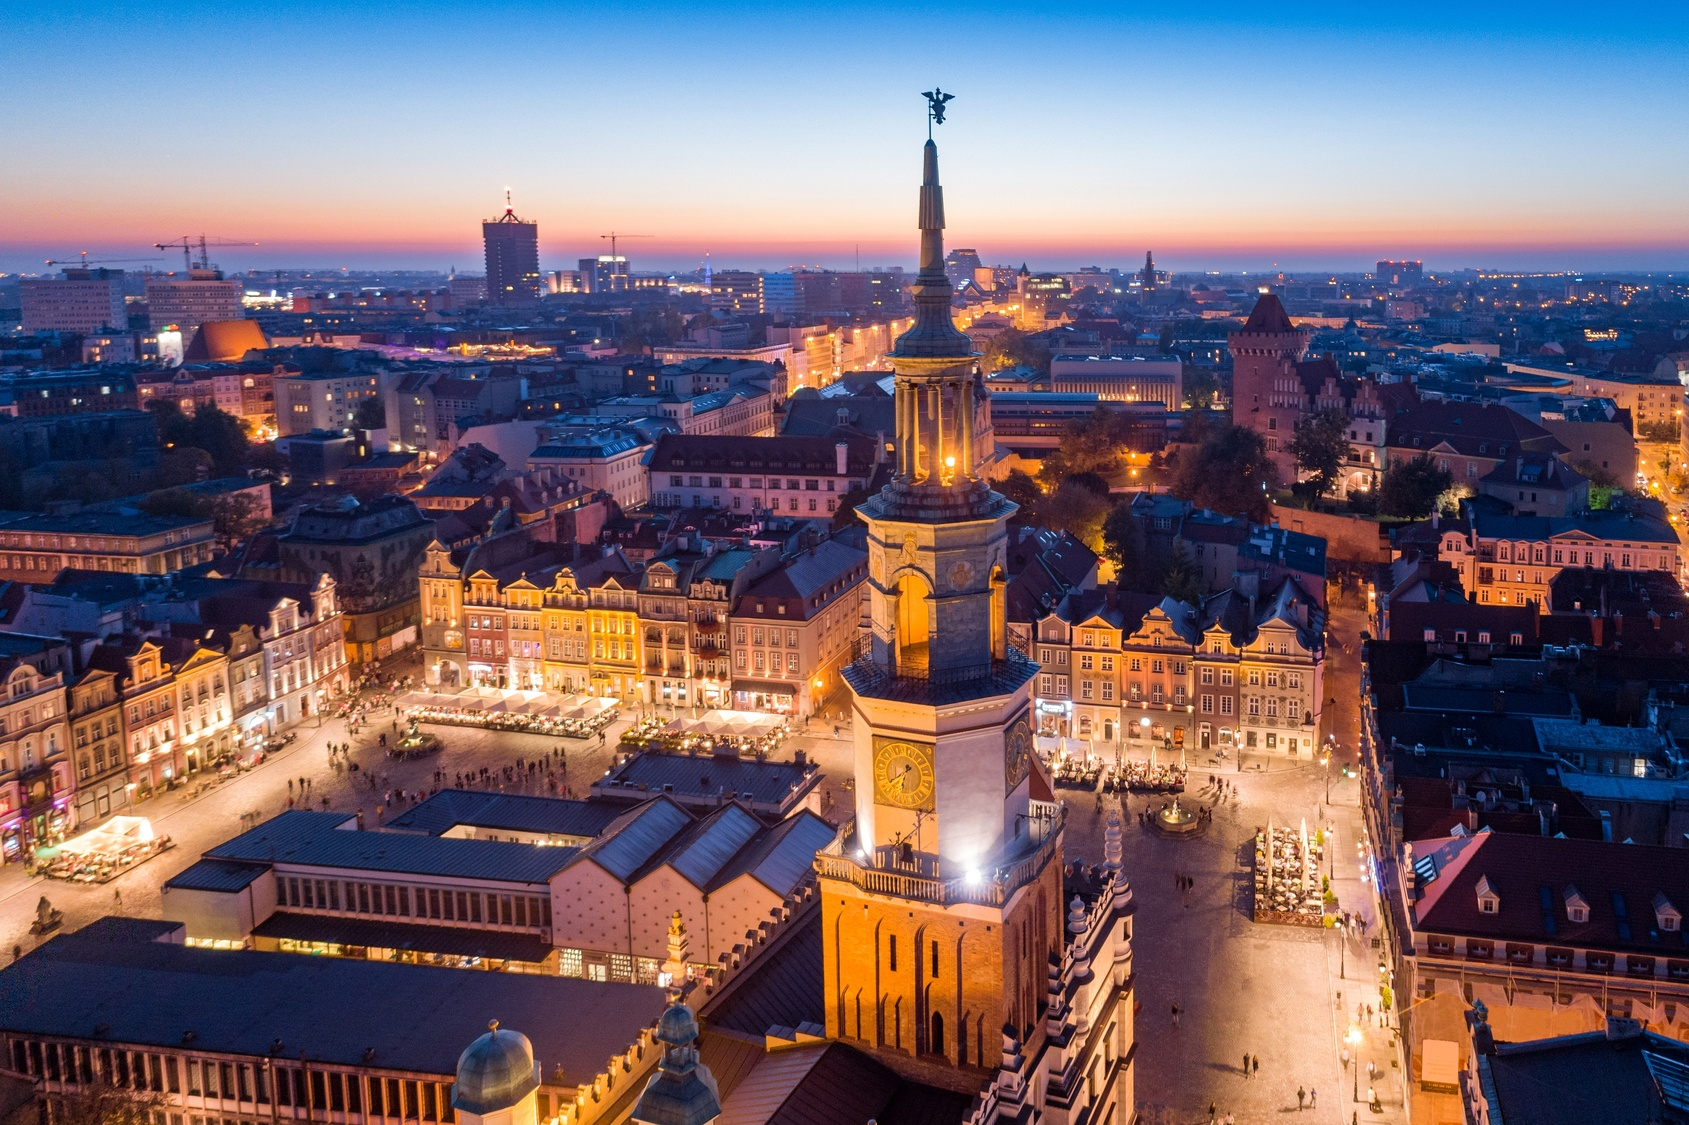 Alt du bør vite om Poznań